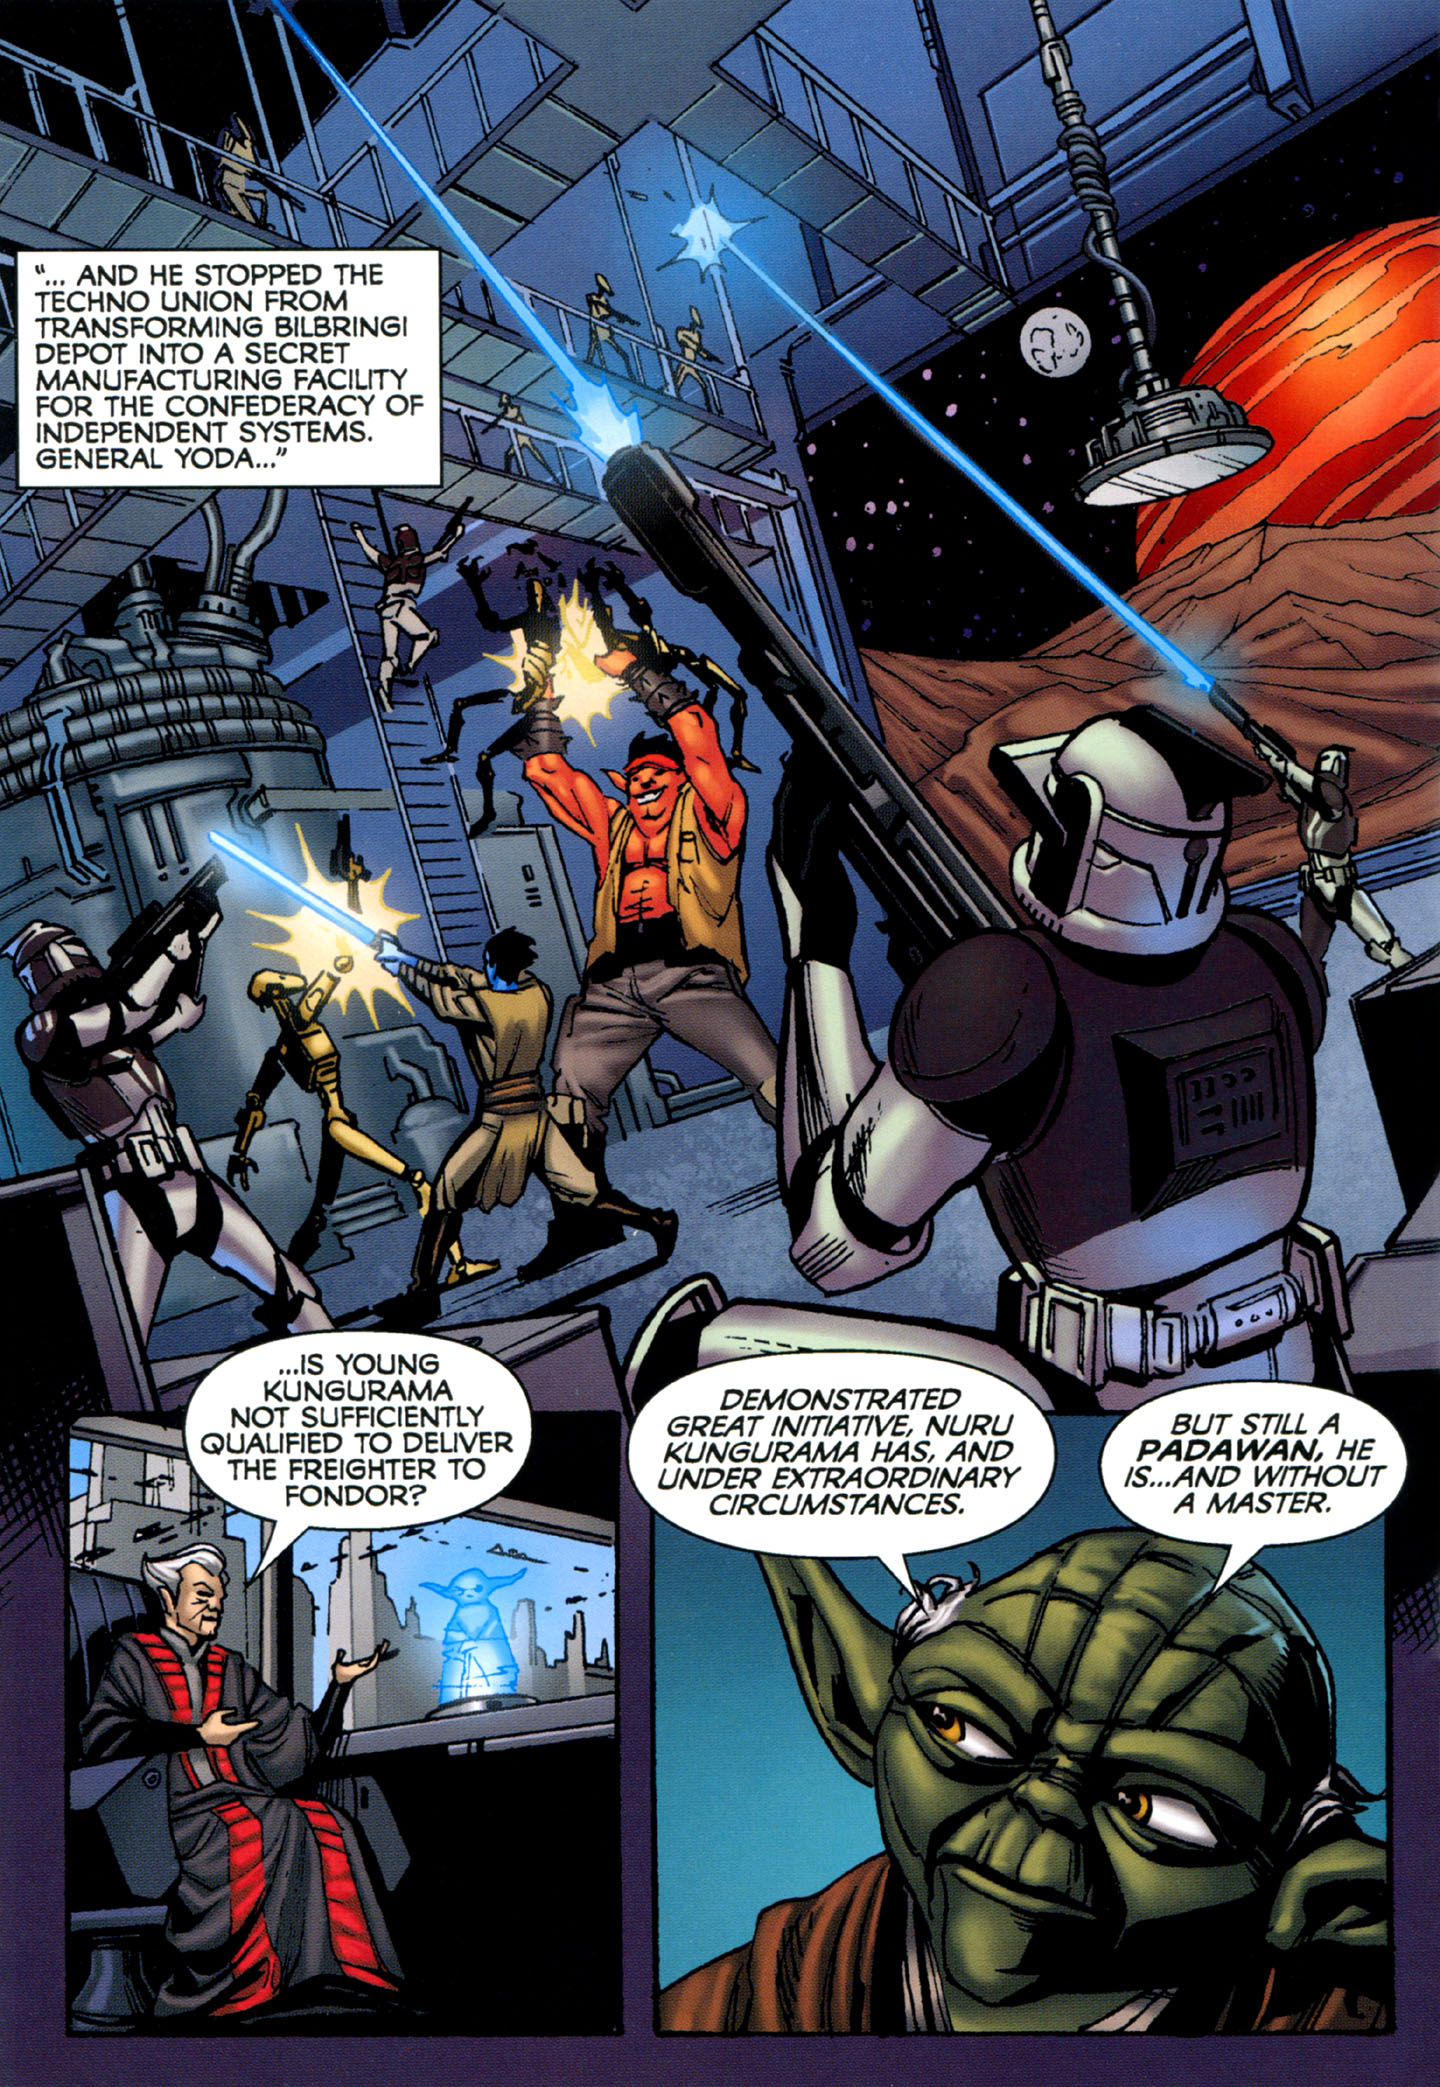 Read online Star Wars: The Clone Wars - Strange Allies comic -  Issue # Full - 15